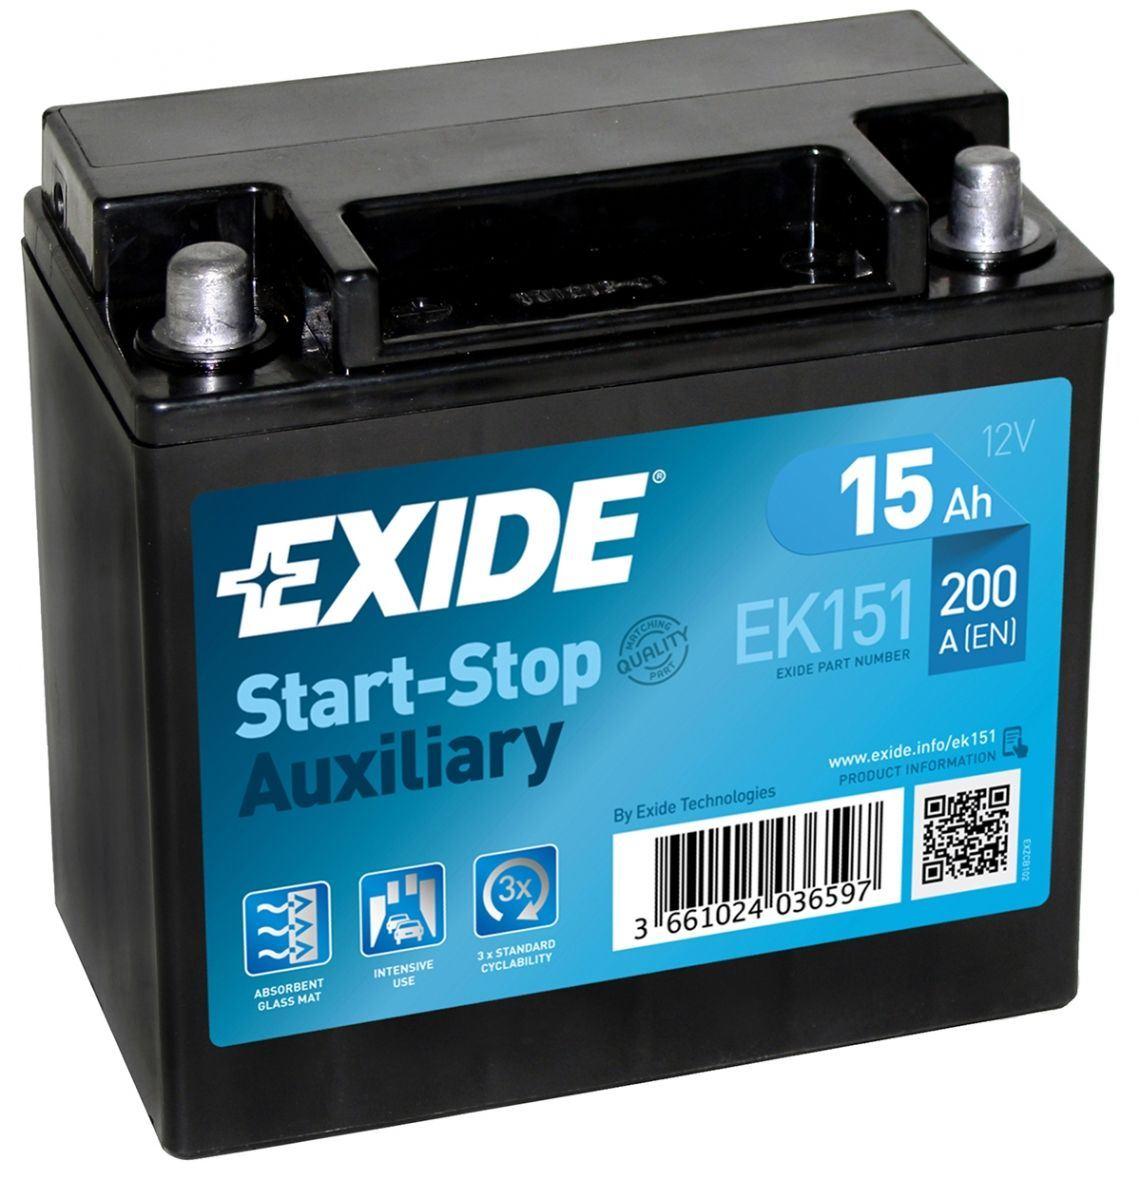 Imagen de Batería EXIDE EK151 Auxiliar (equivale a TUDOR TK151)